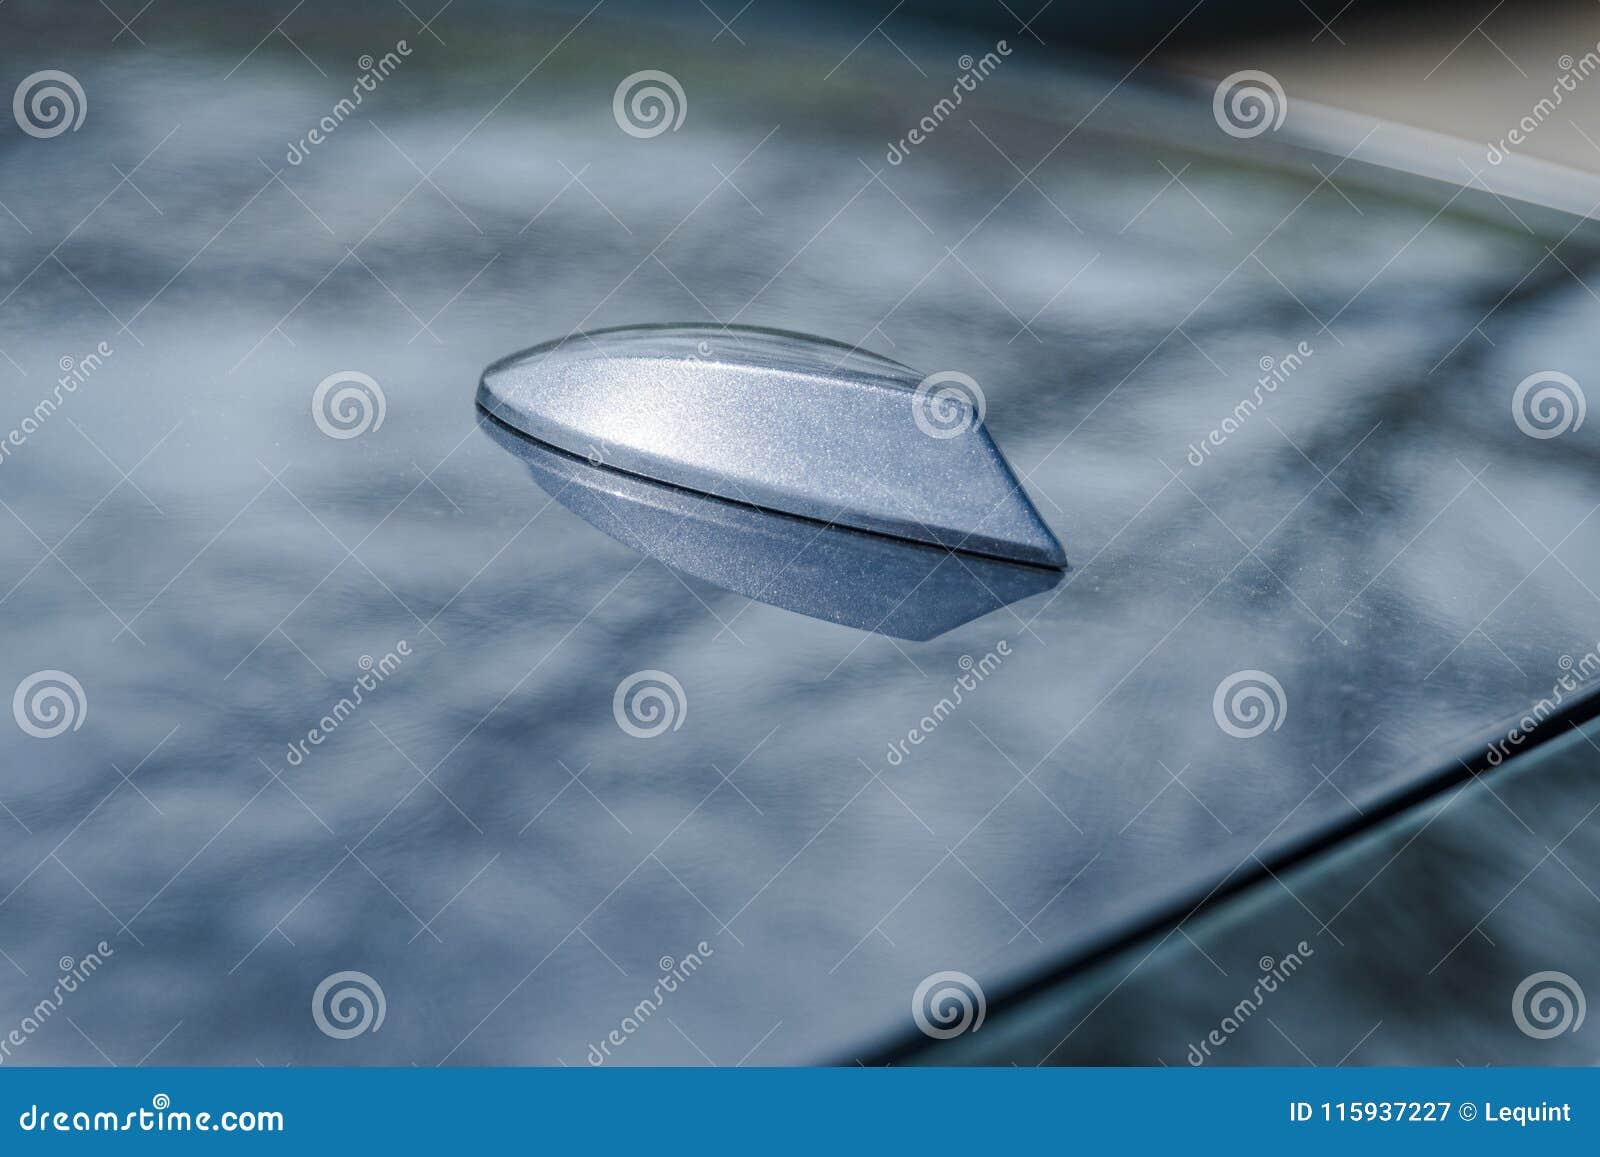 Shark Fin Roof Antenna On Modern Car Sedan Stock Image